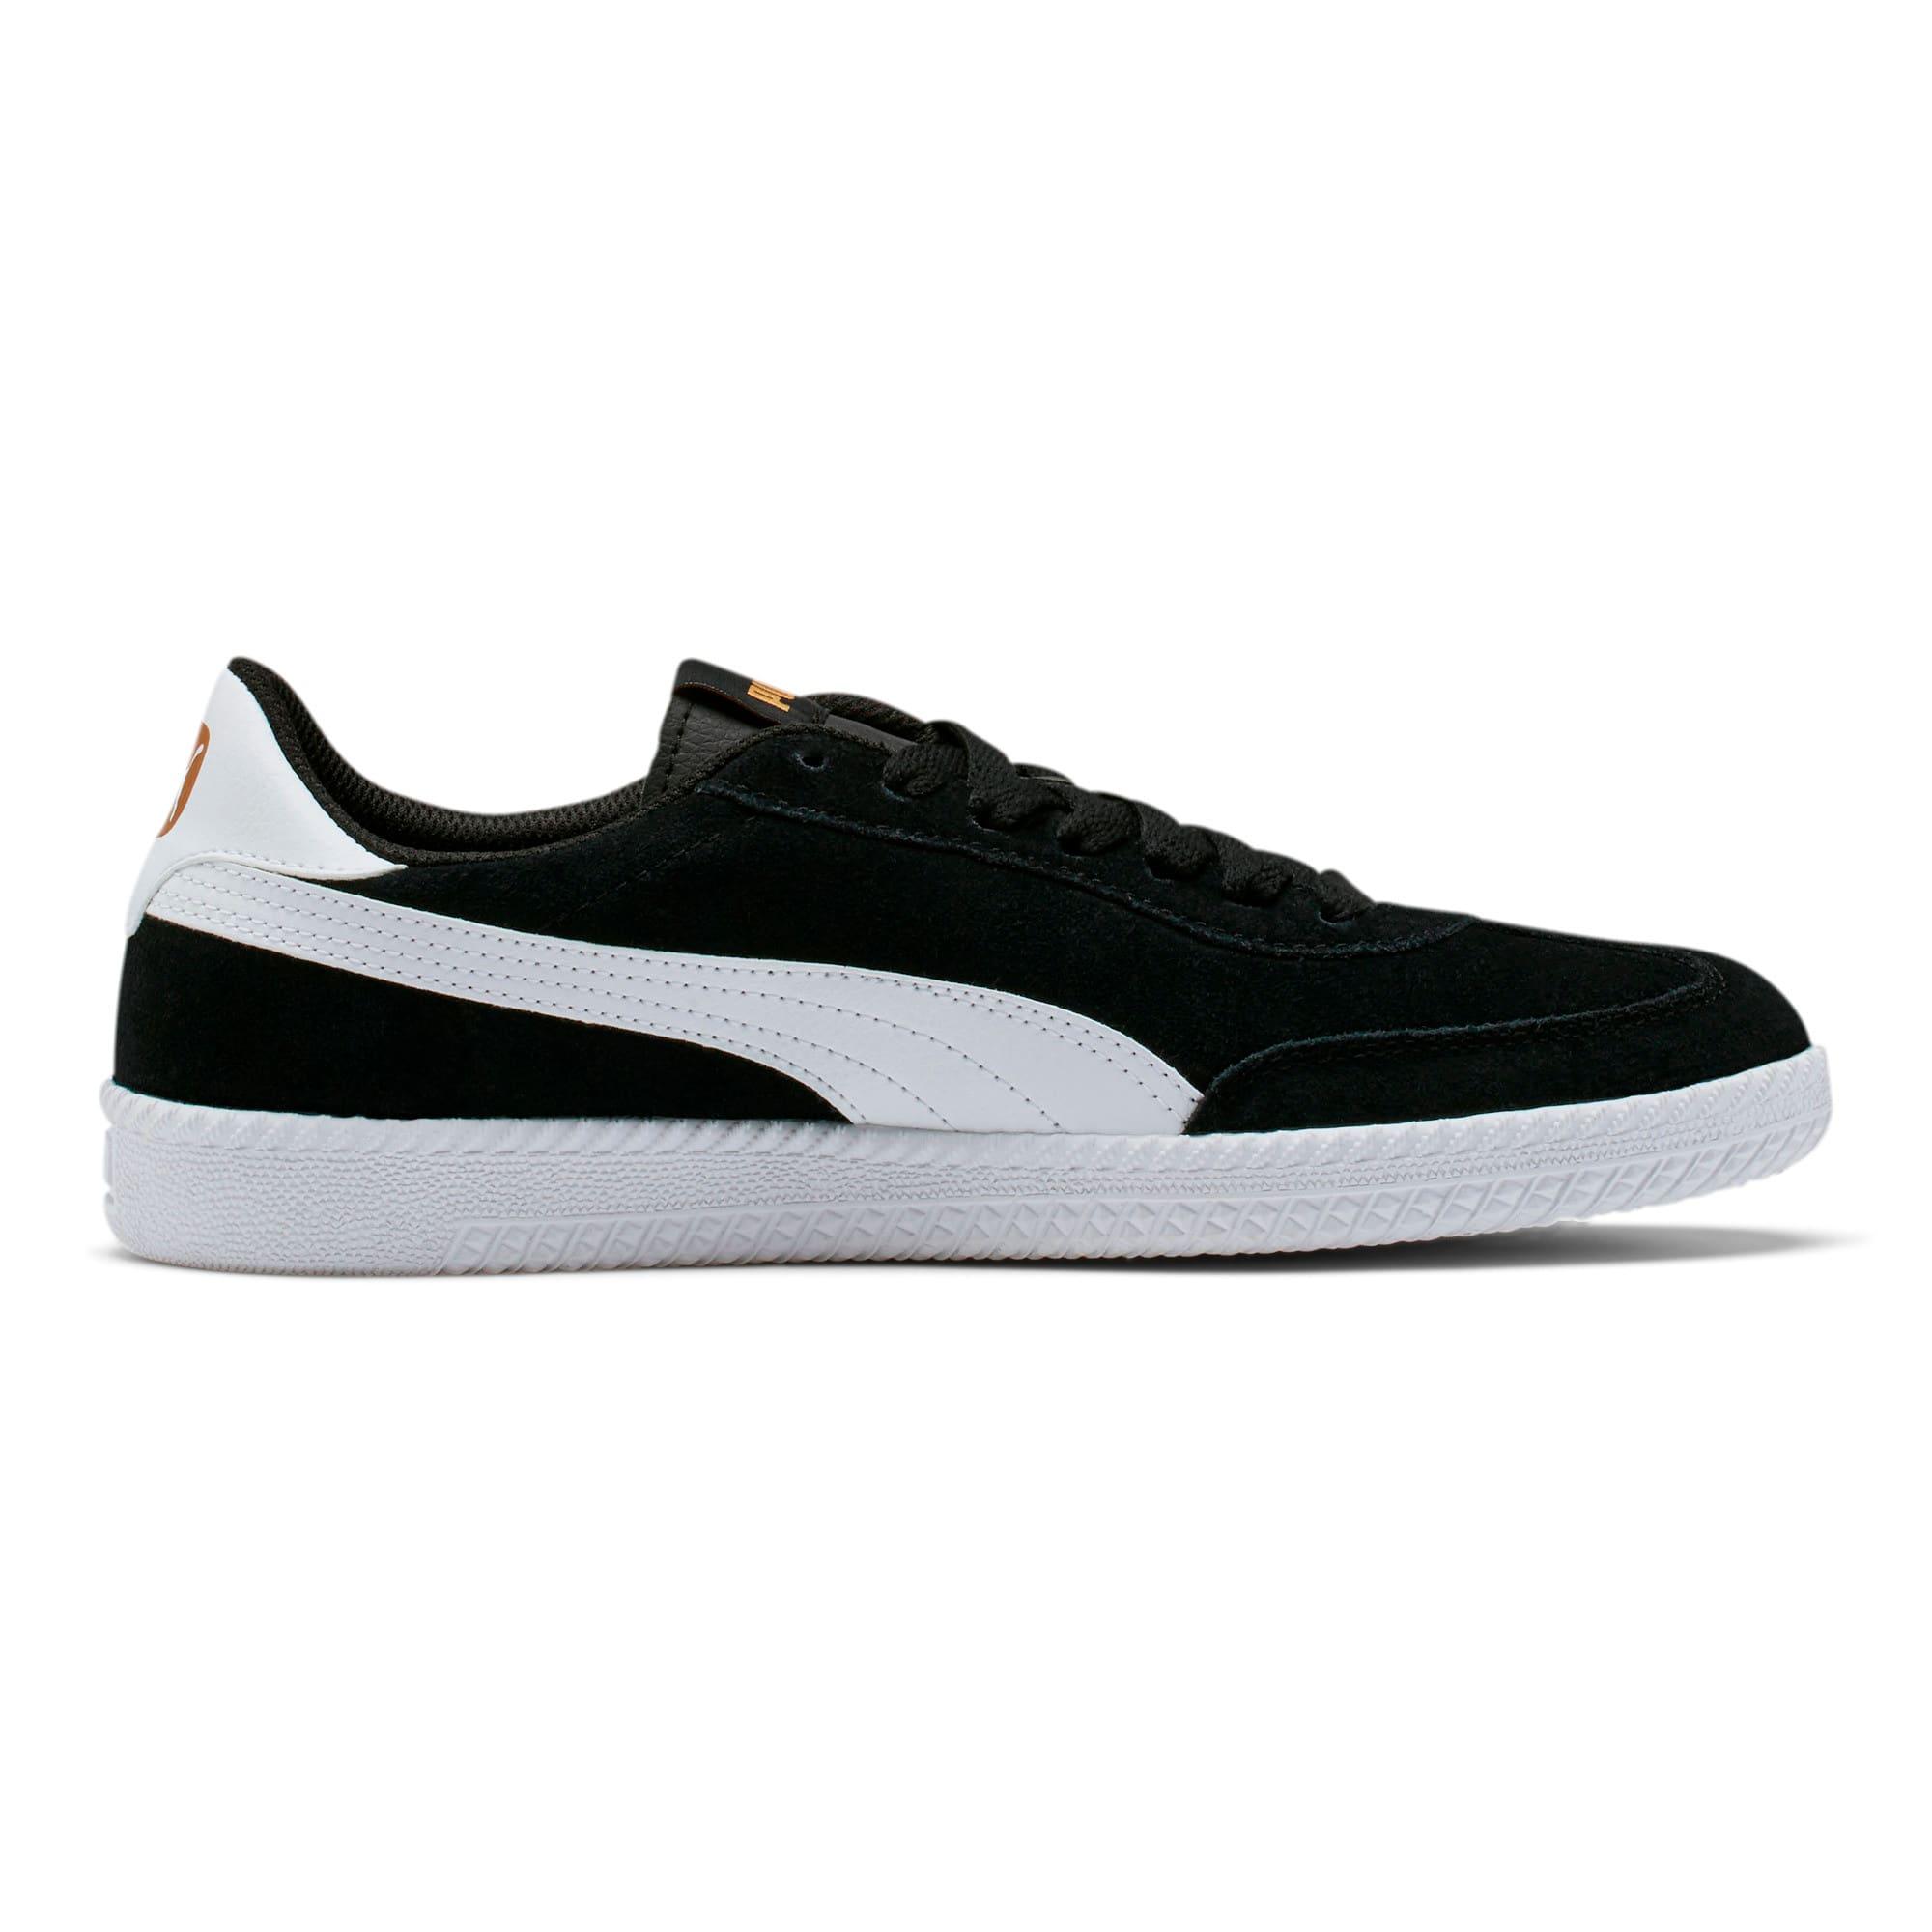 Thumbnail 5 of Astro Cup Suede Sneakers, Puma Black-Puma White, medium